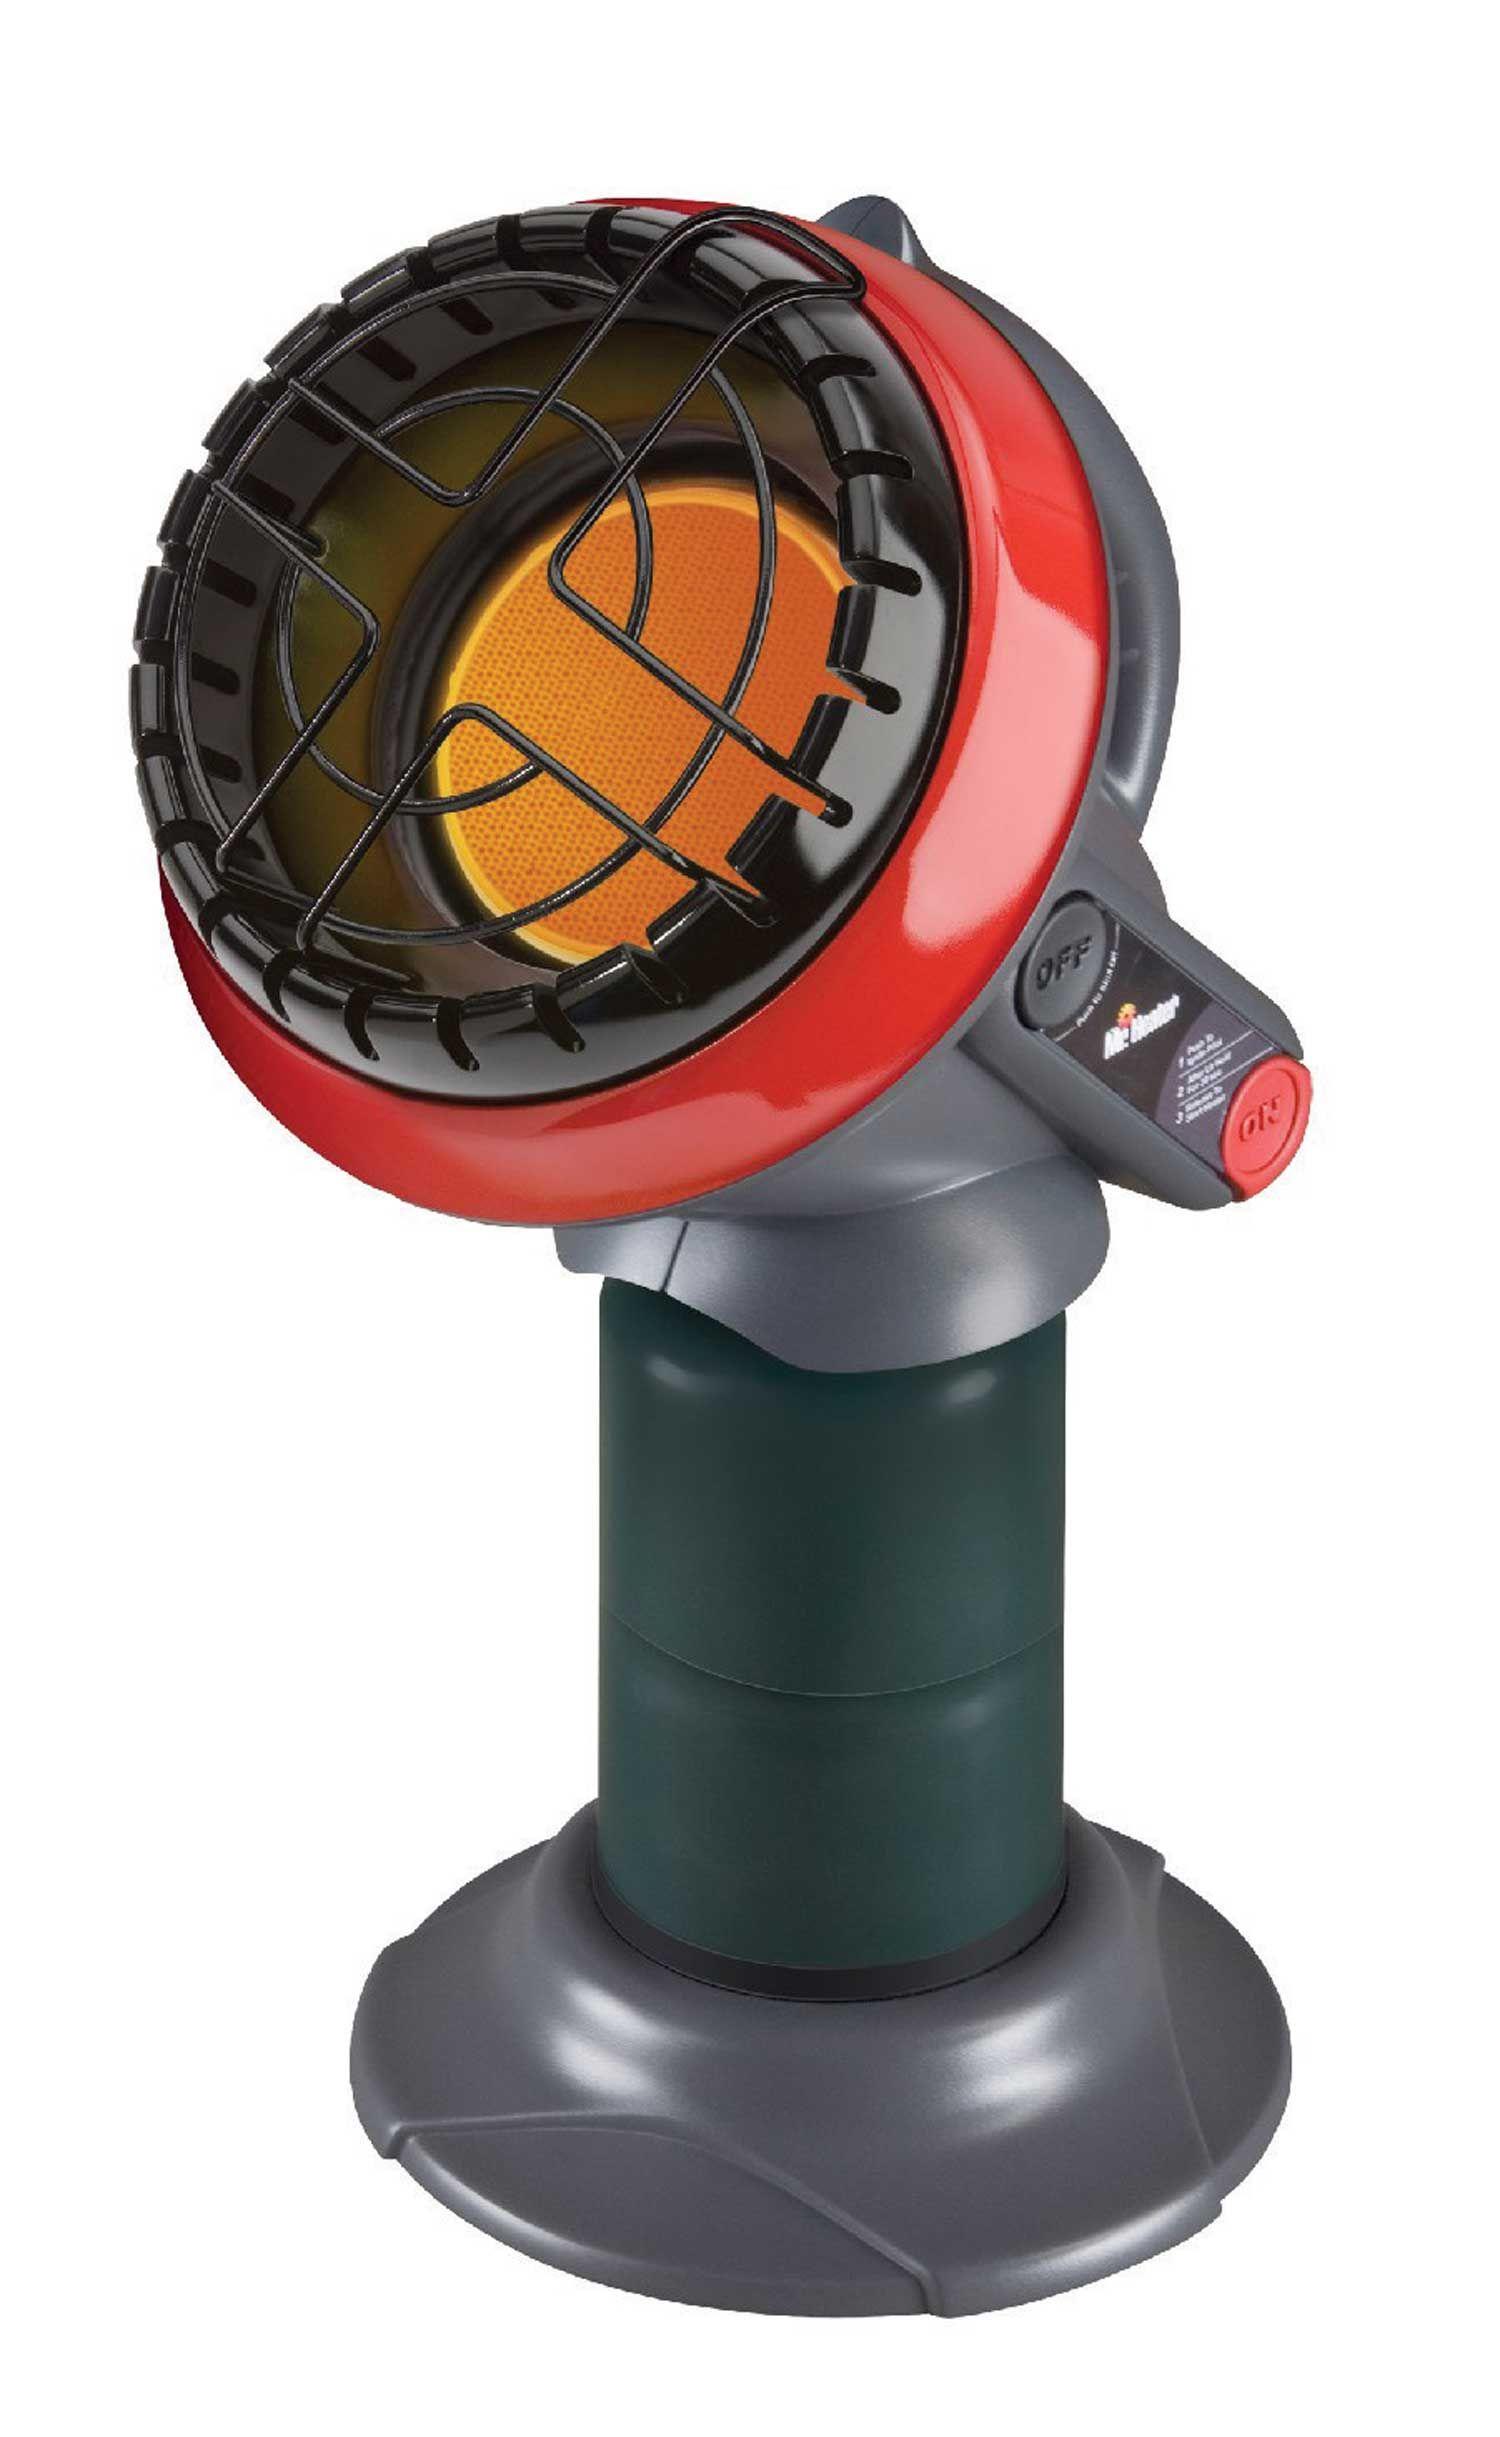 Mr. Heater Little Buddy Heater Tent heater, Portable